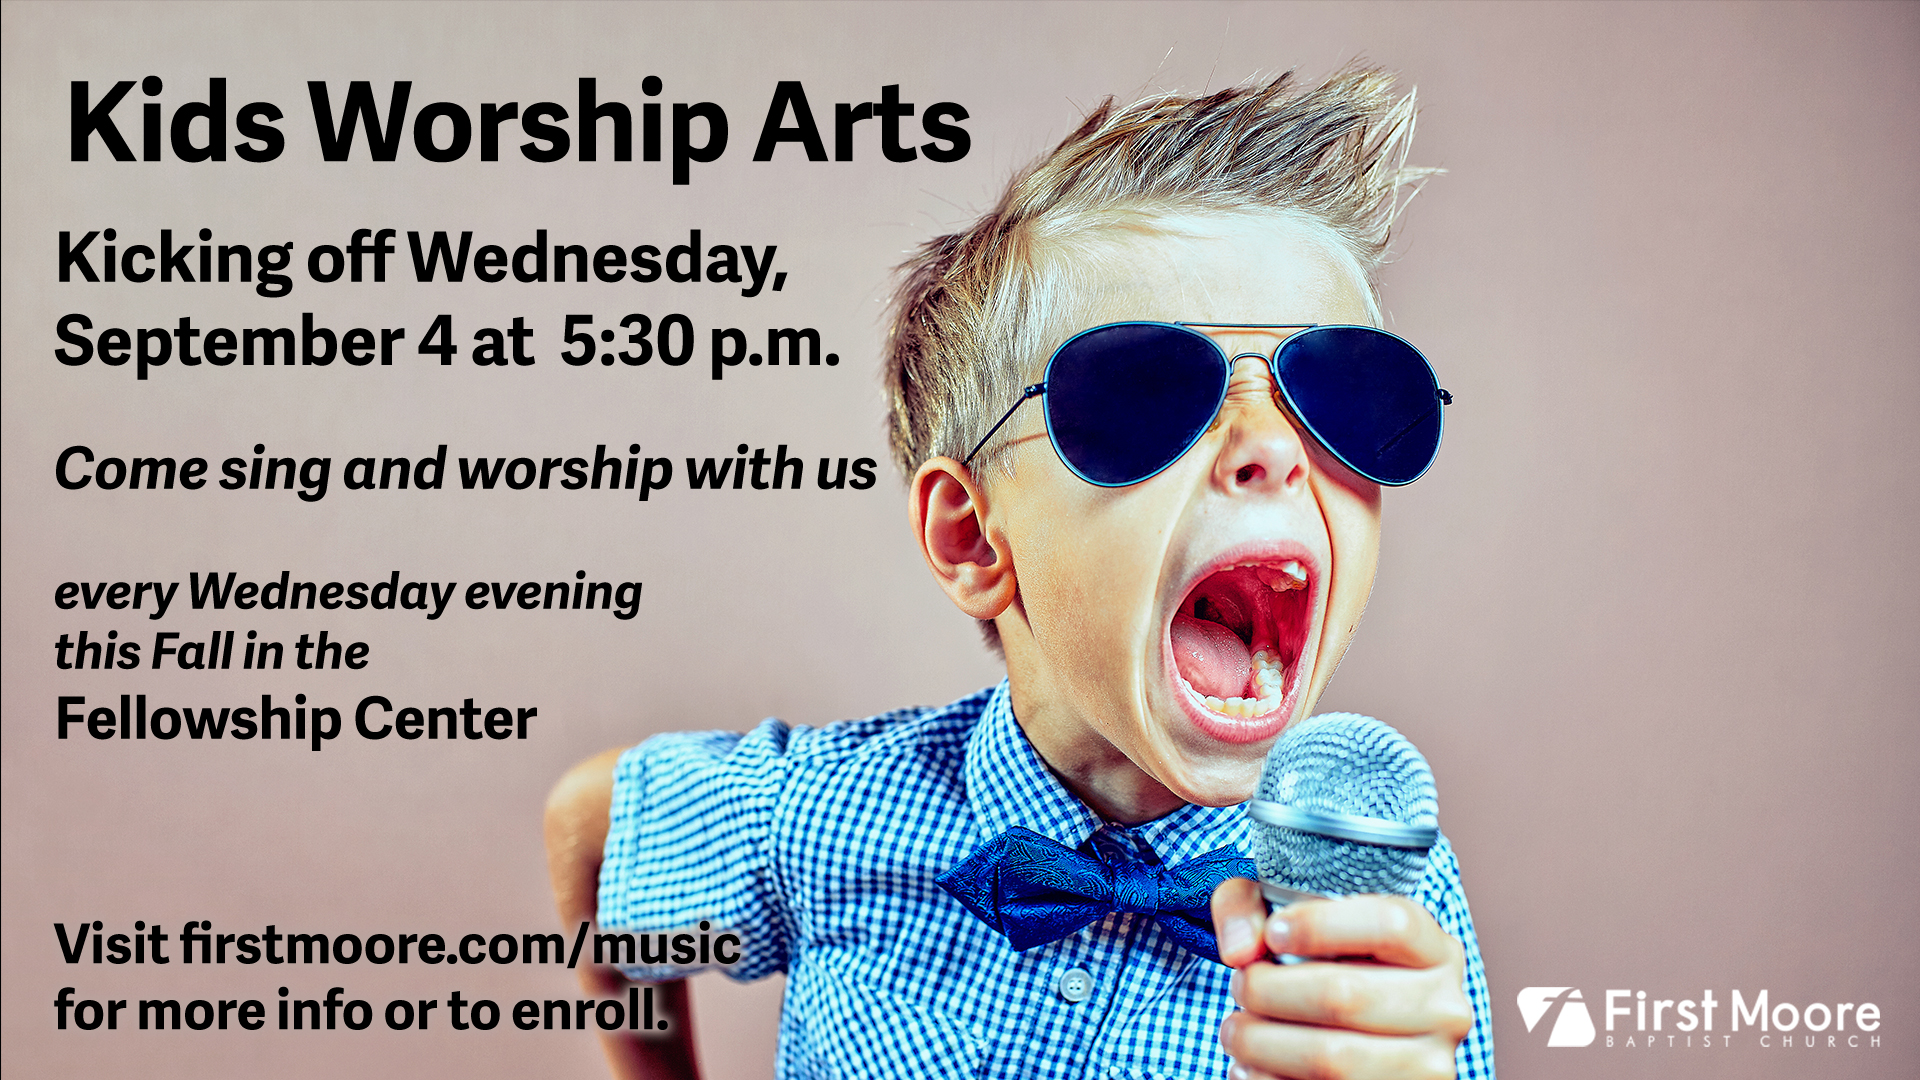 Kids_Worship_Arts-16x9.jpg